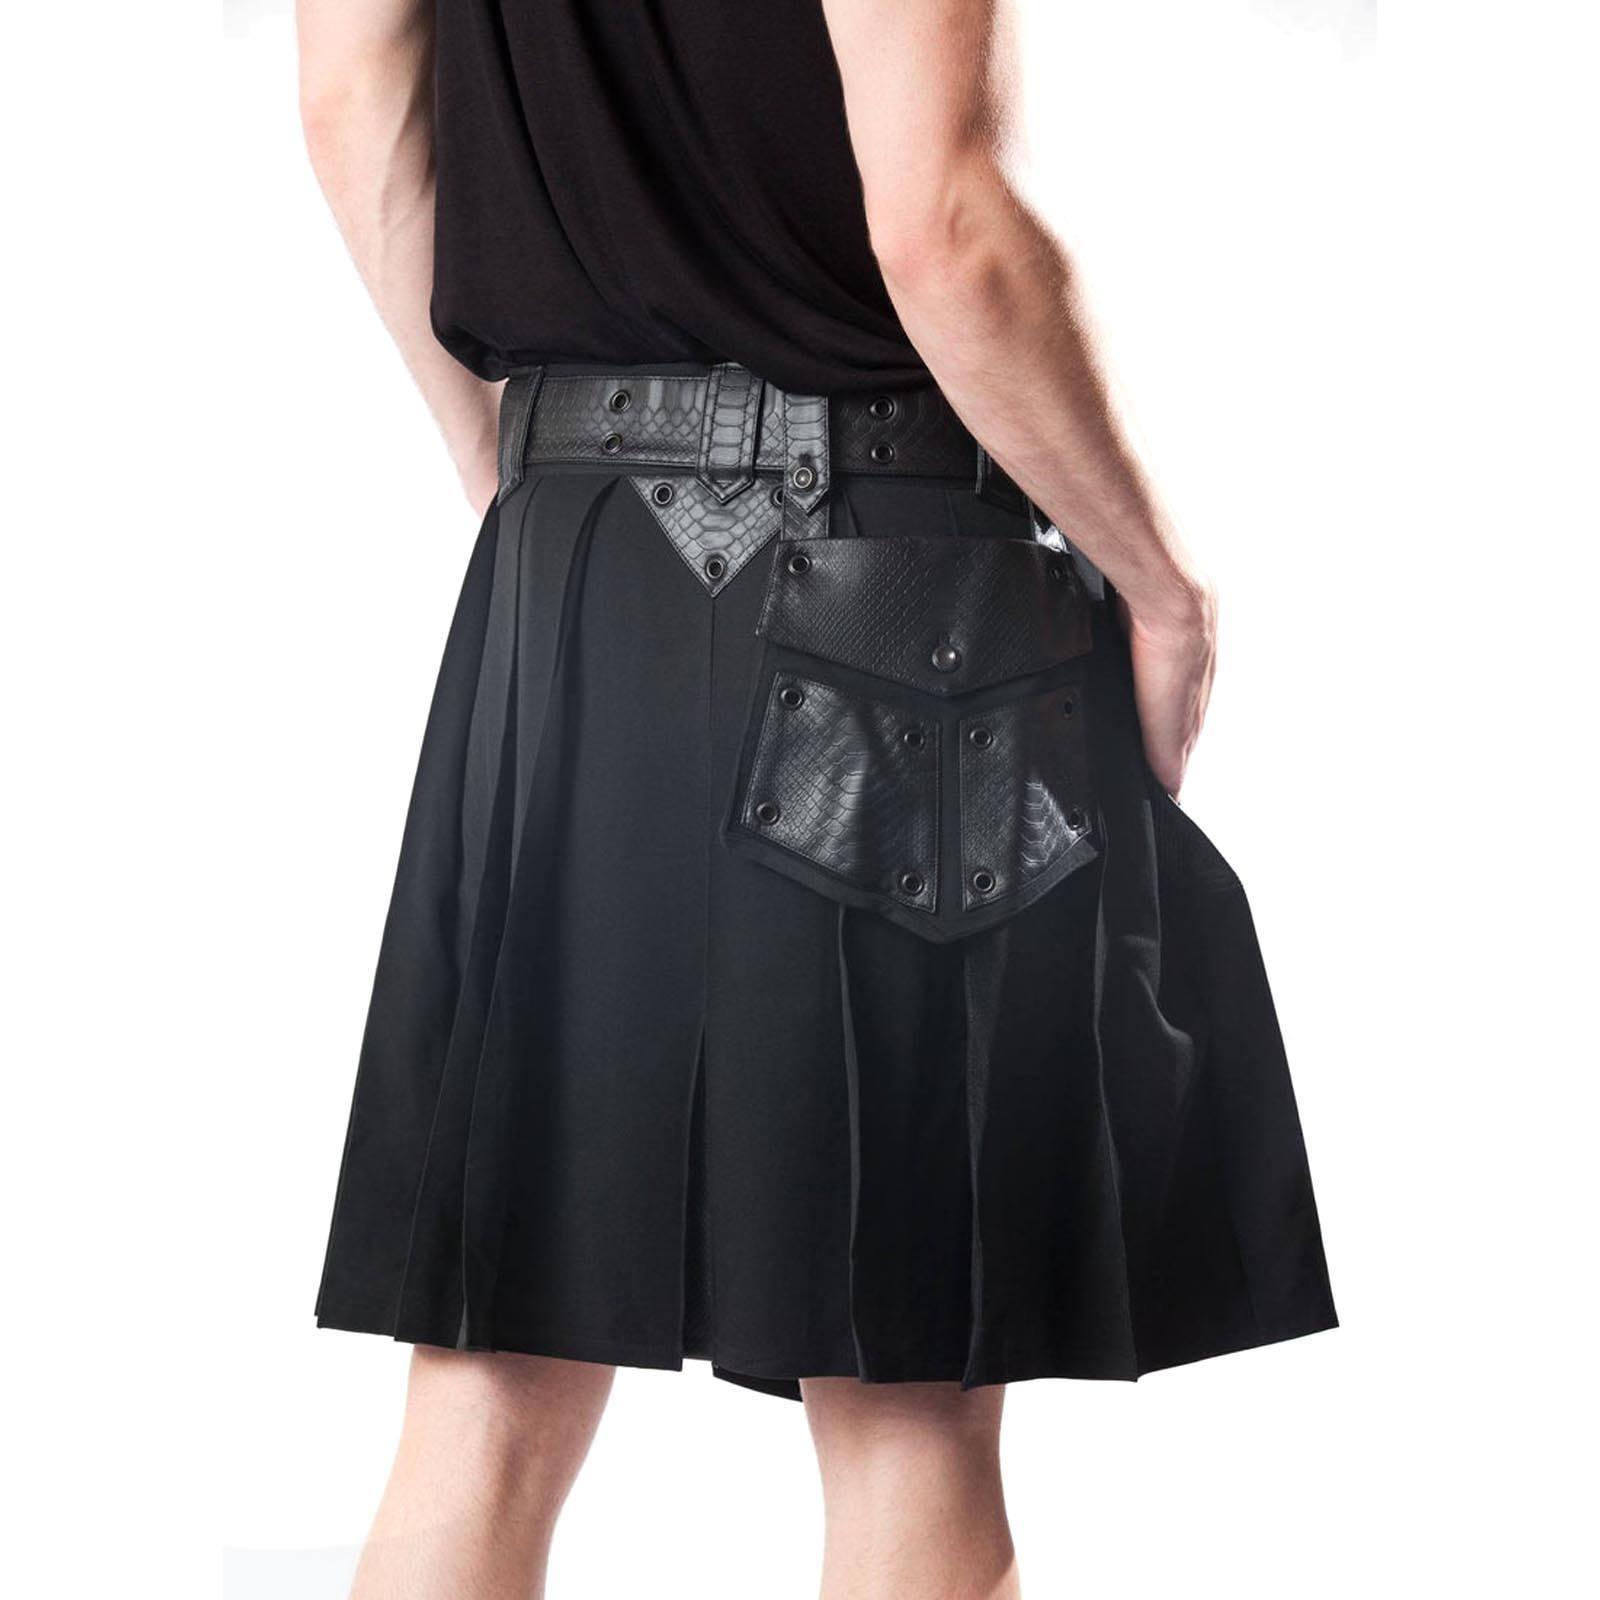 Leather Gothic Utility Kilt